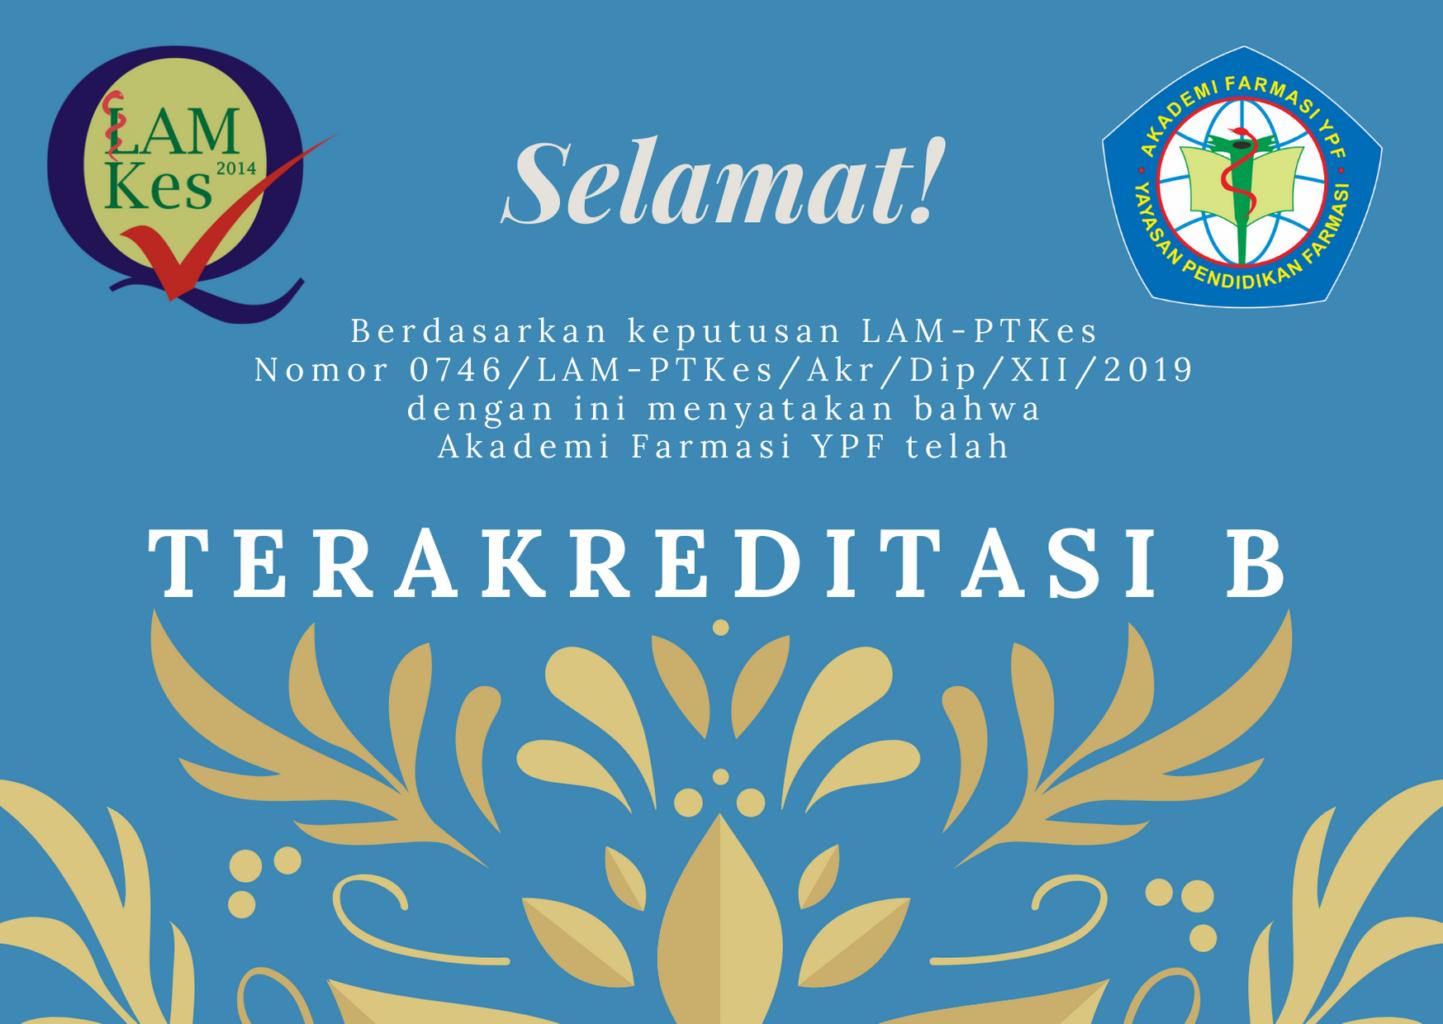 Lowongan Dosen: Akademi Farmasi YPF Kota Bandung